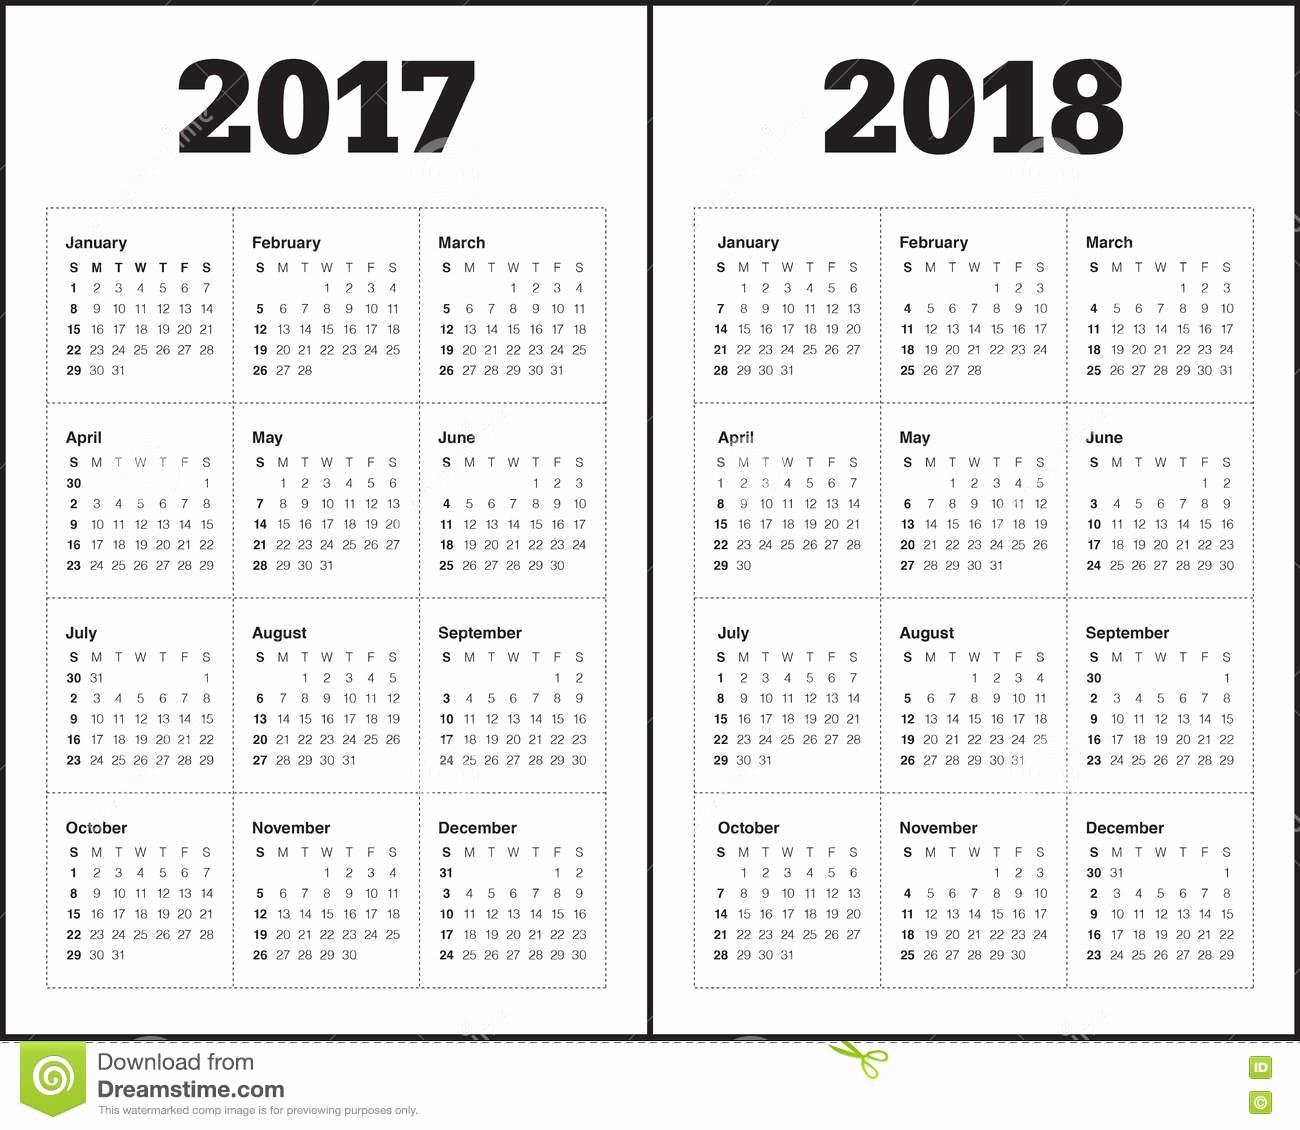 2017-2018 Blank Calendar Lovely Simple Calendar Template for 2017 and 2018 Stock Vector